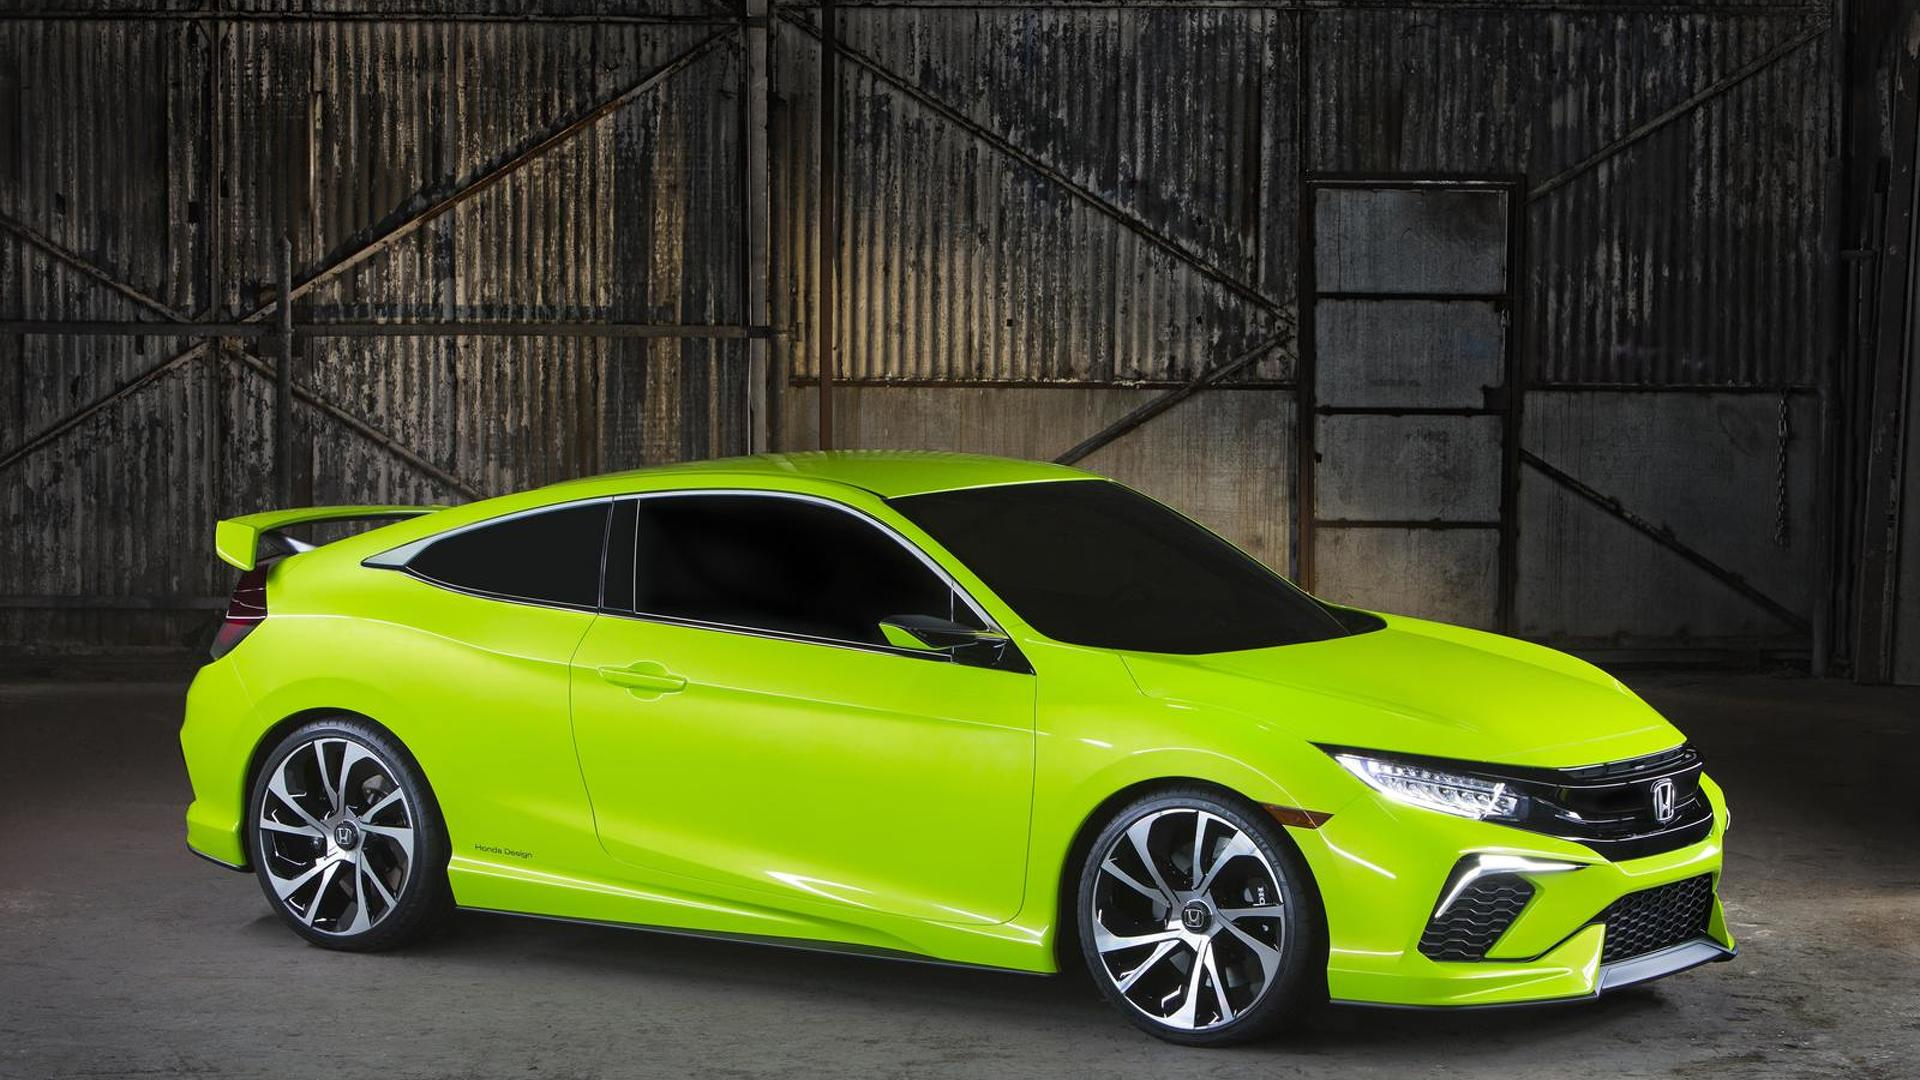 New Honda Civic coming this fall, Civic Hybrid & Civic CNG to be axed